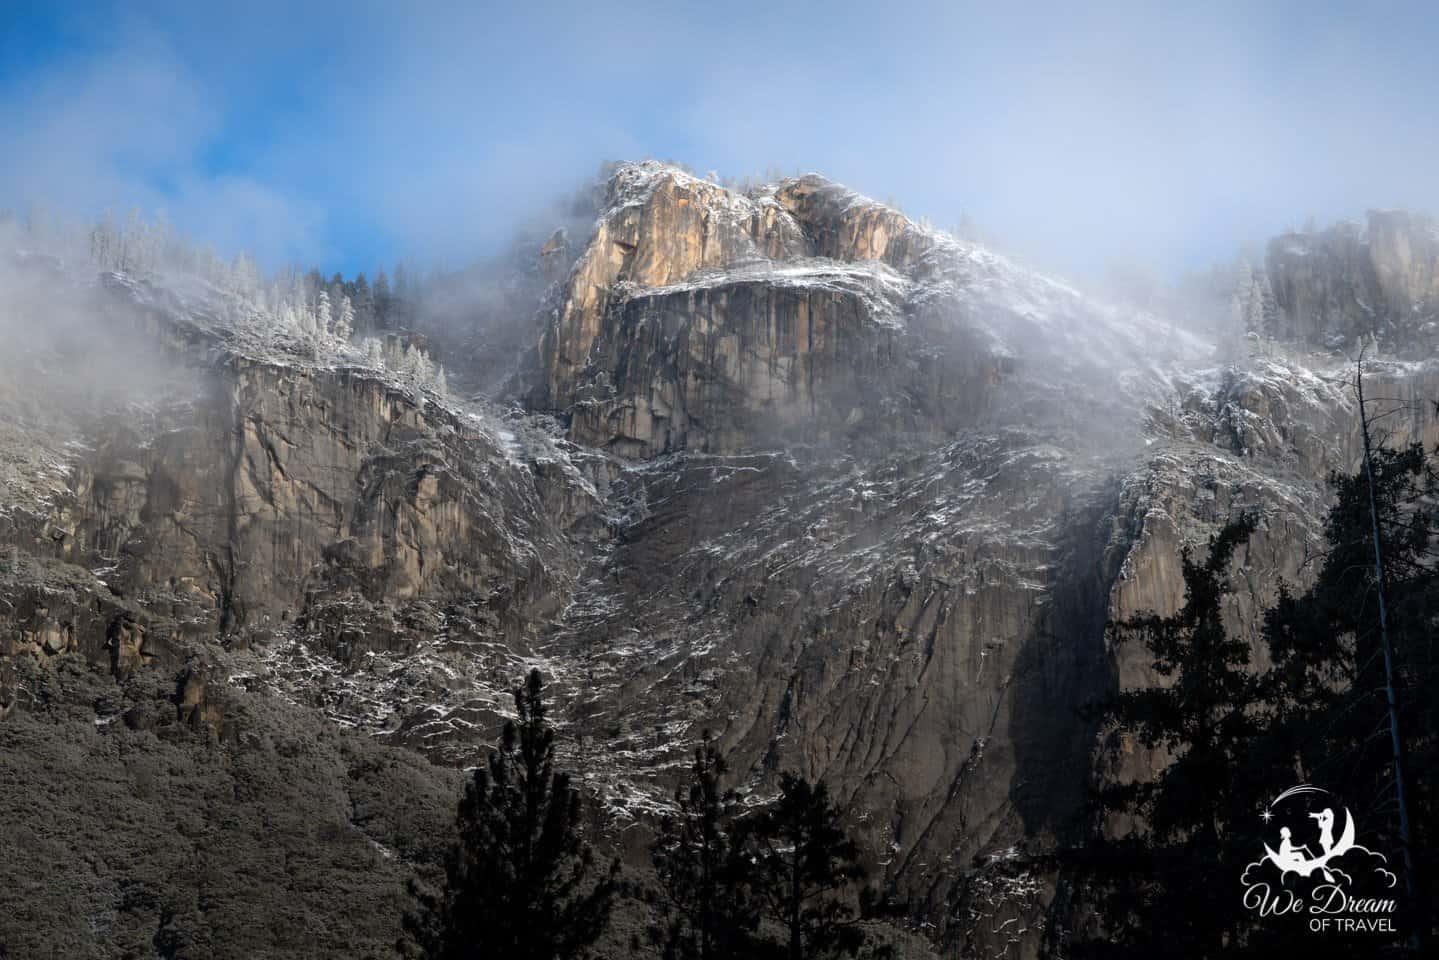 The granite cliffs of Yosemite shine golden in the morning sunlight.